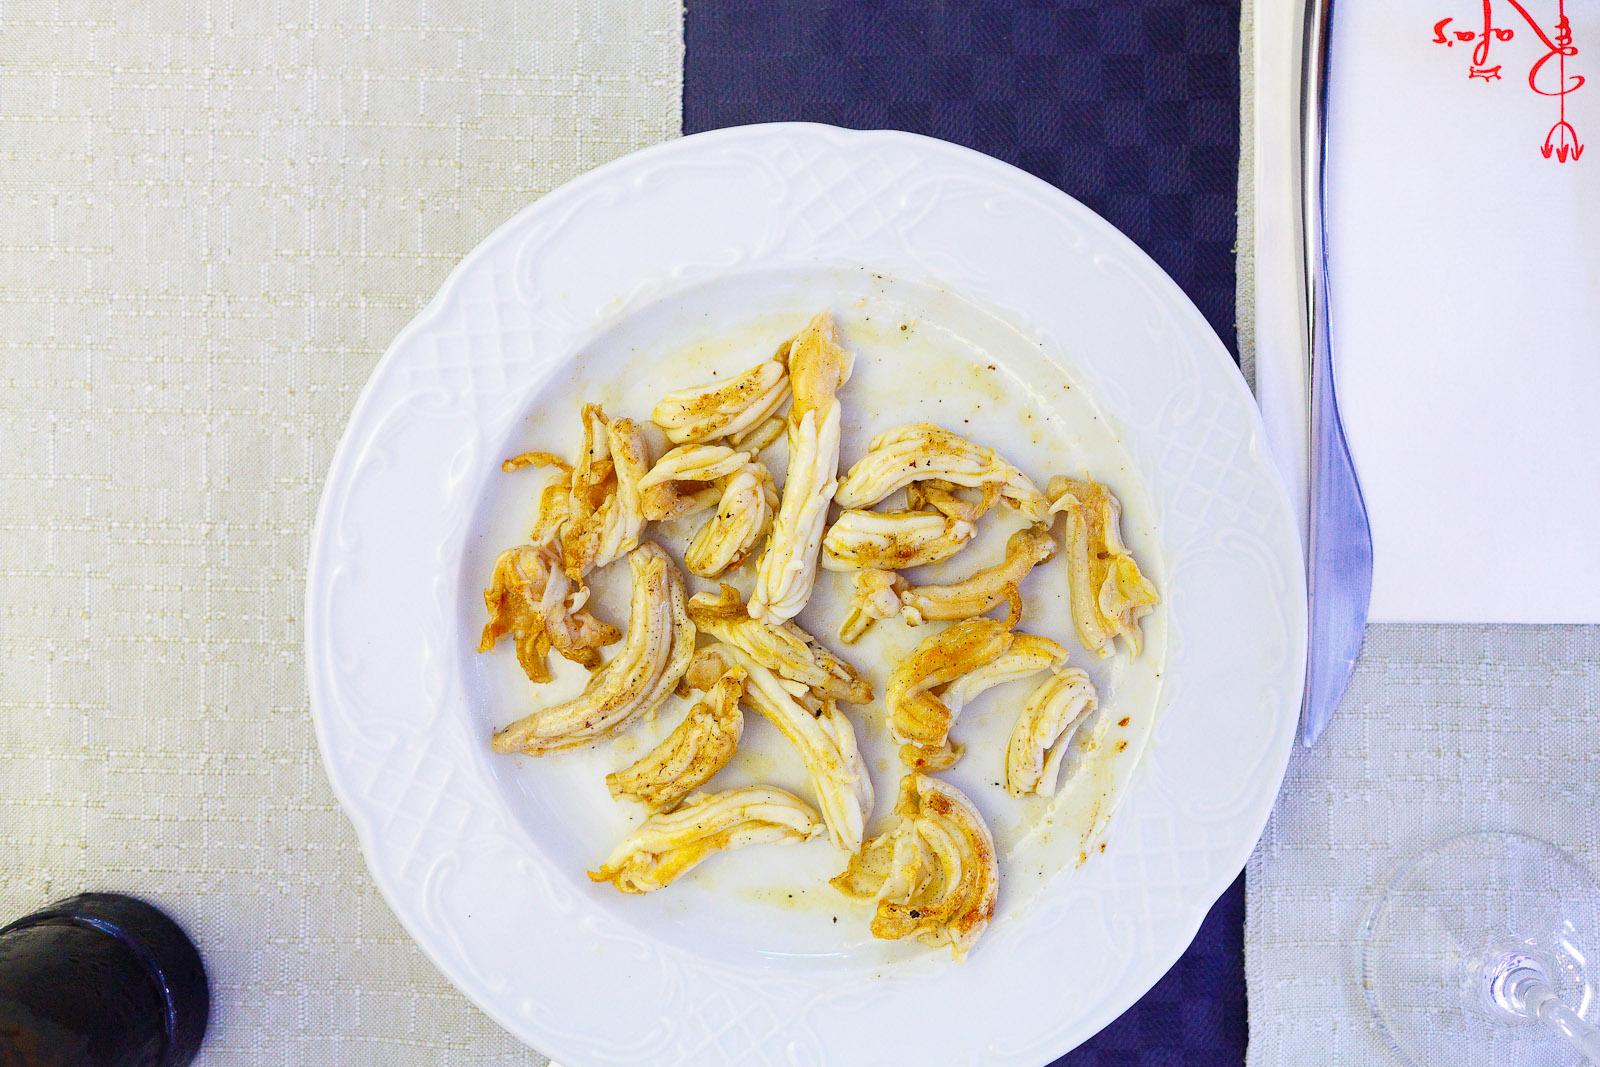 Espardenyes (Mediterranean sea cucumbers) a la plancha